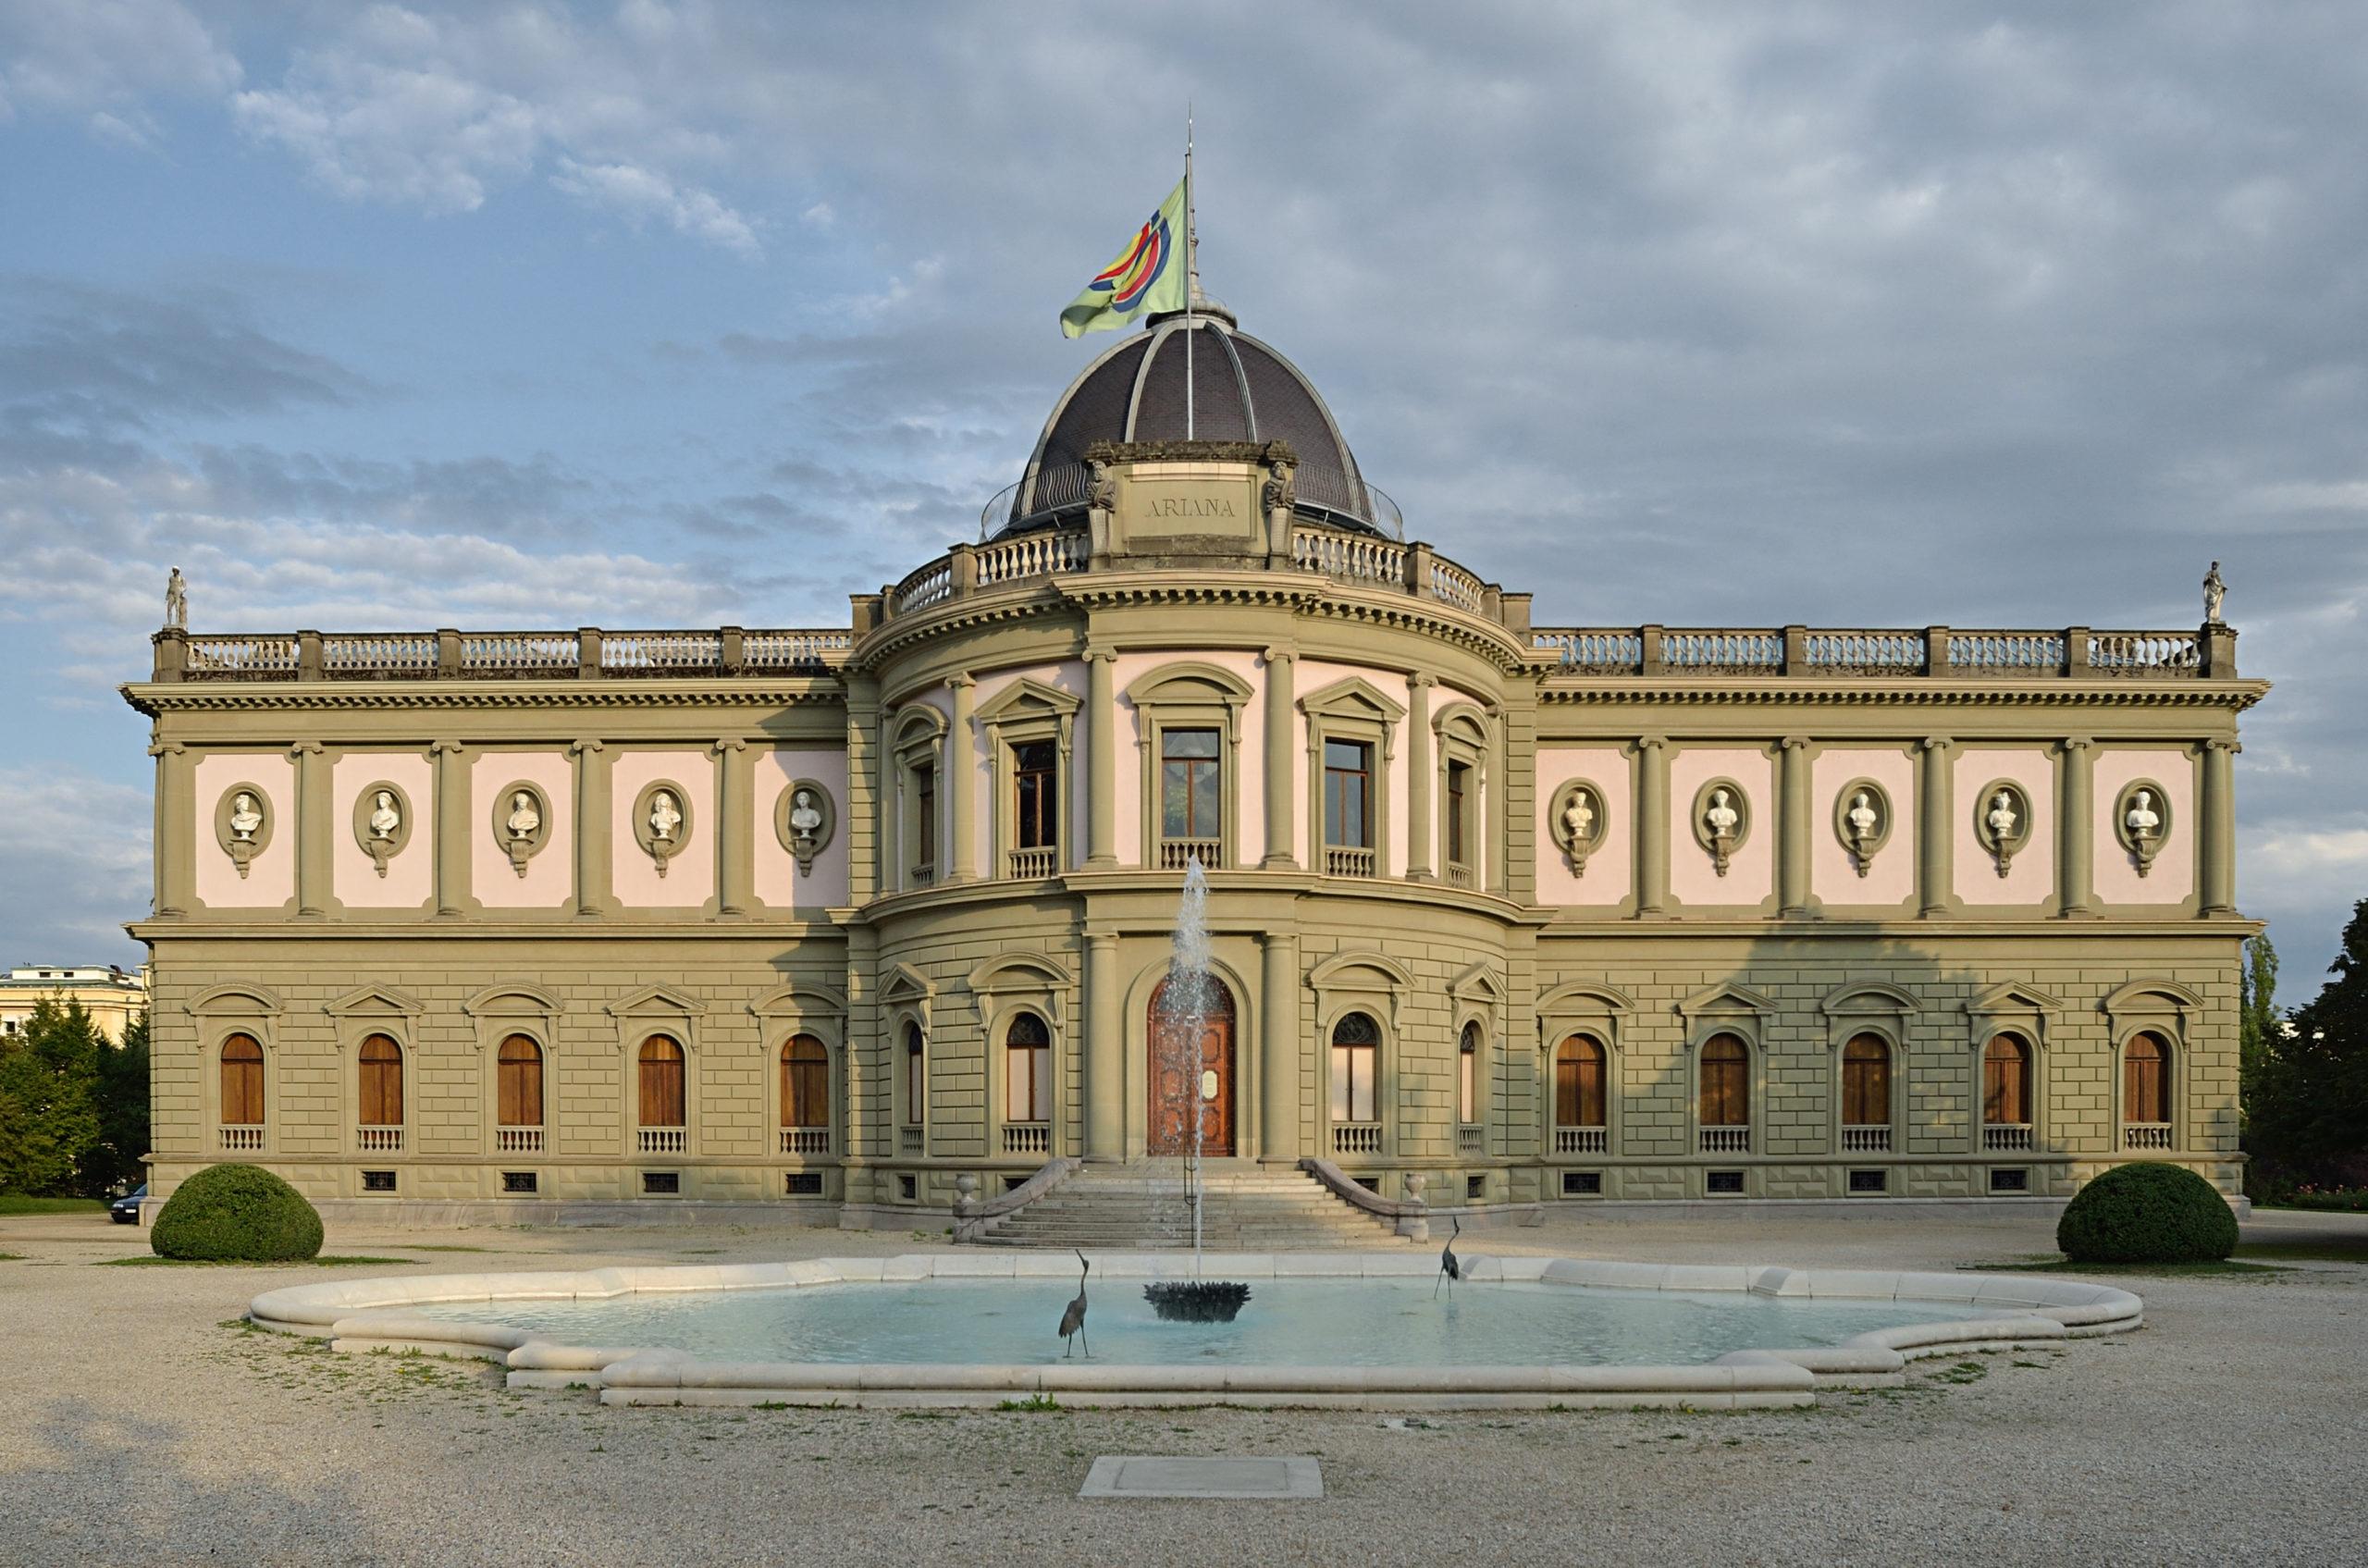 Musee ariana-gfuerst-wiki